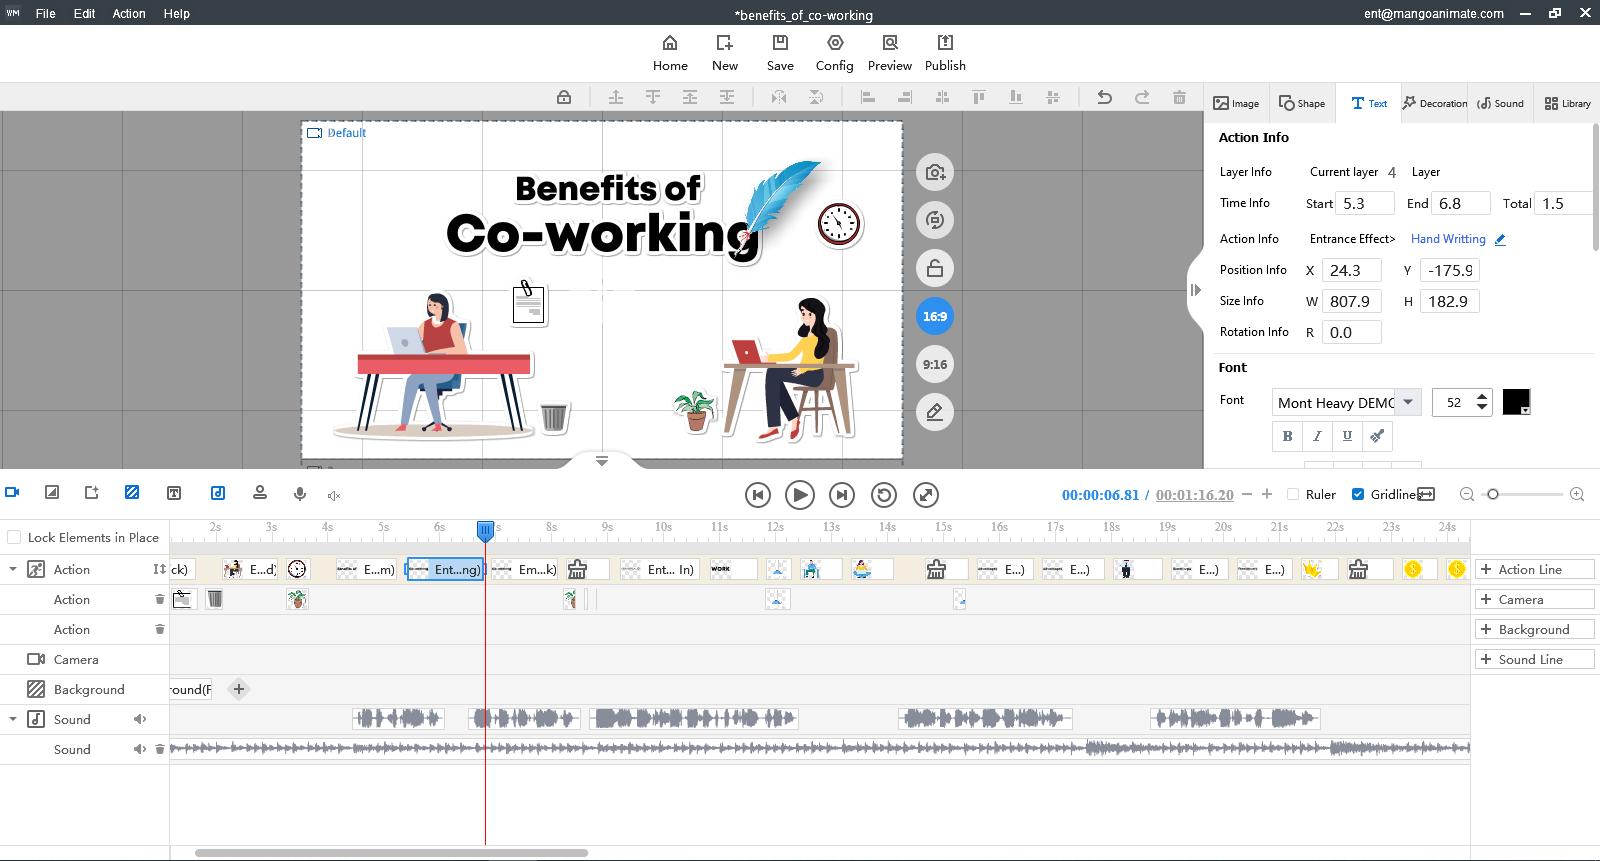 Mango Animate Whiteboard Animation Maker Lifetime, Animation Software Screenshot